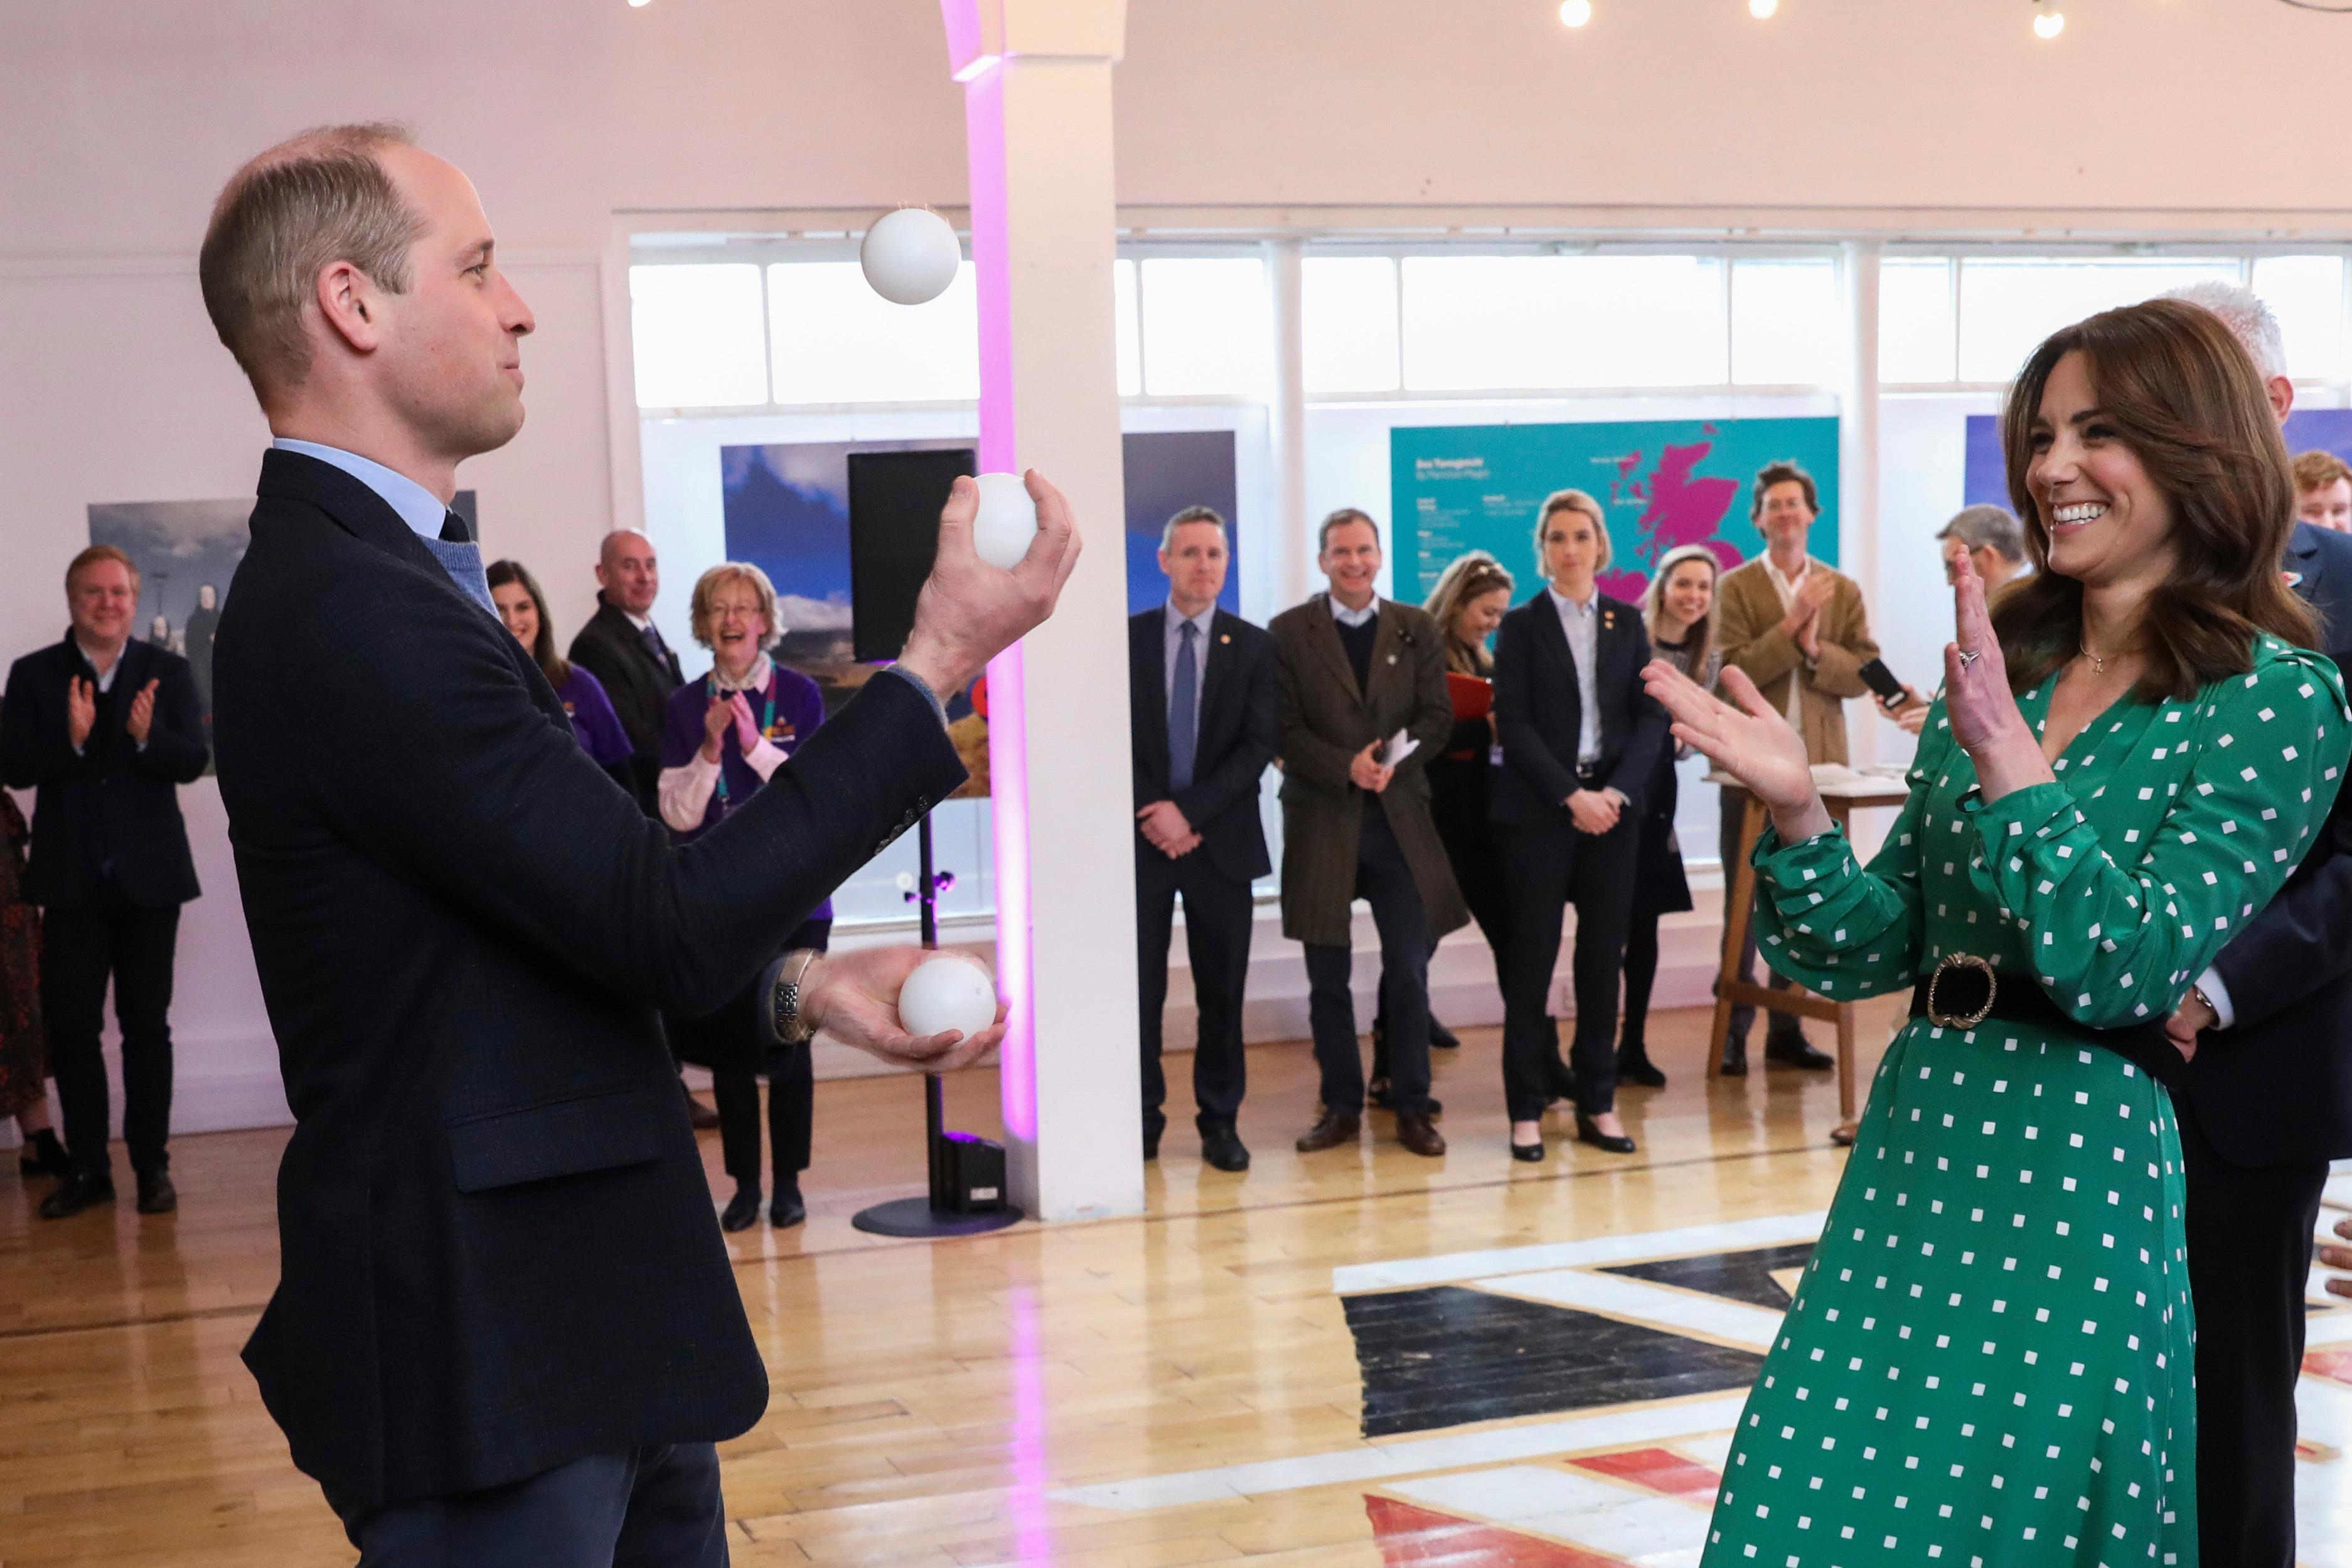 The Duke and Duchess of Cambridge Embark on Royal Tour of Ireland 2020